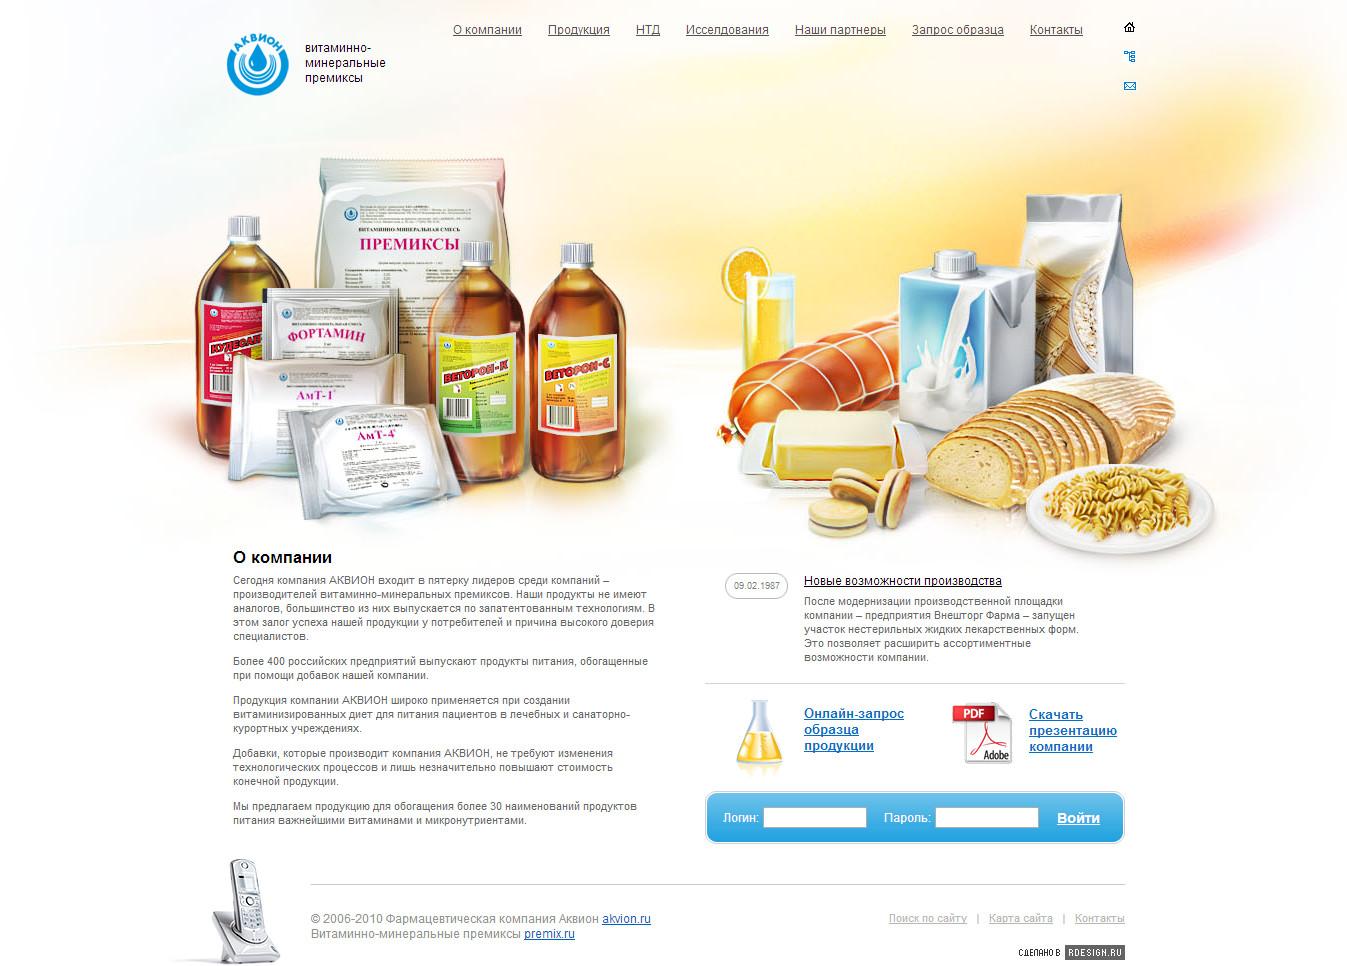 Фармацевтическая компания АКВИОН